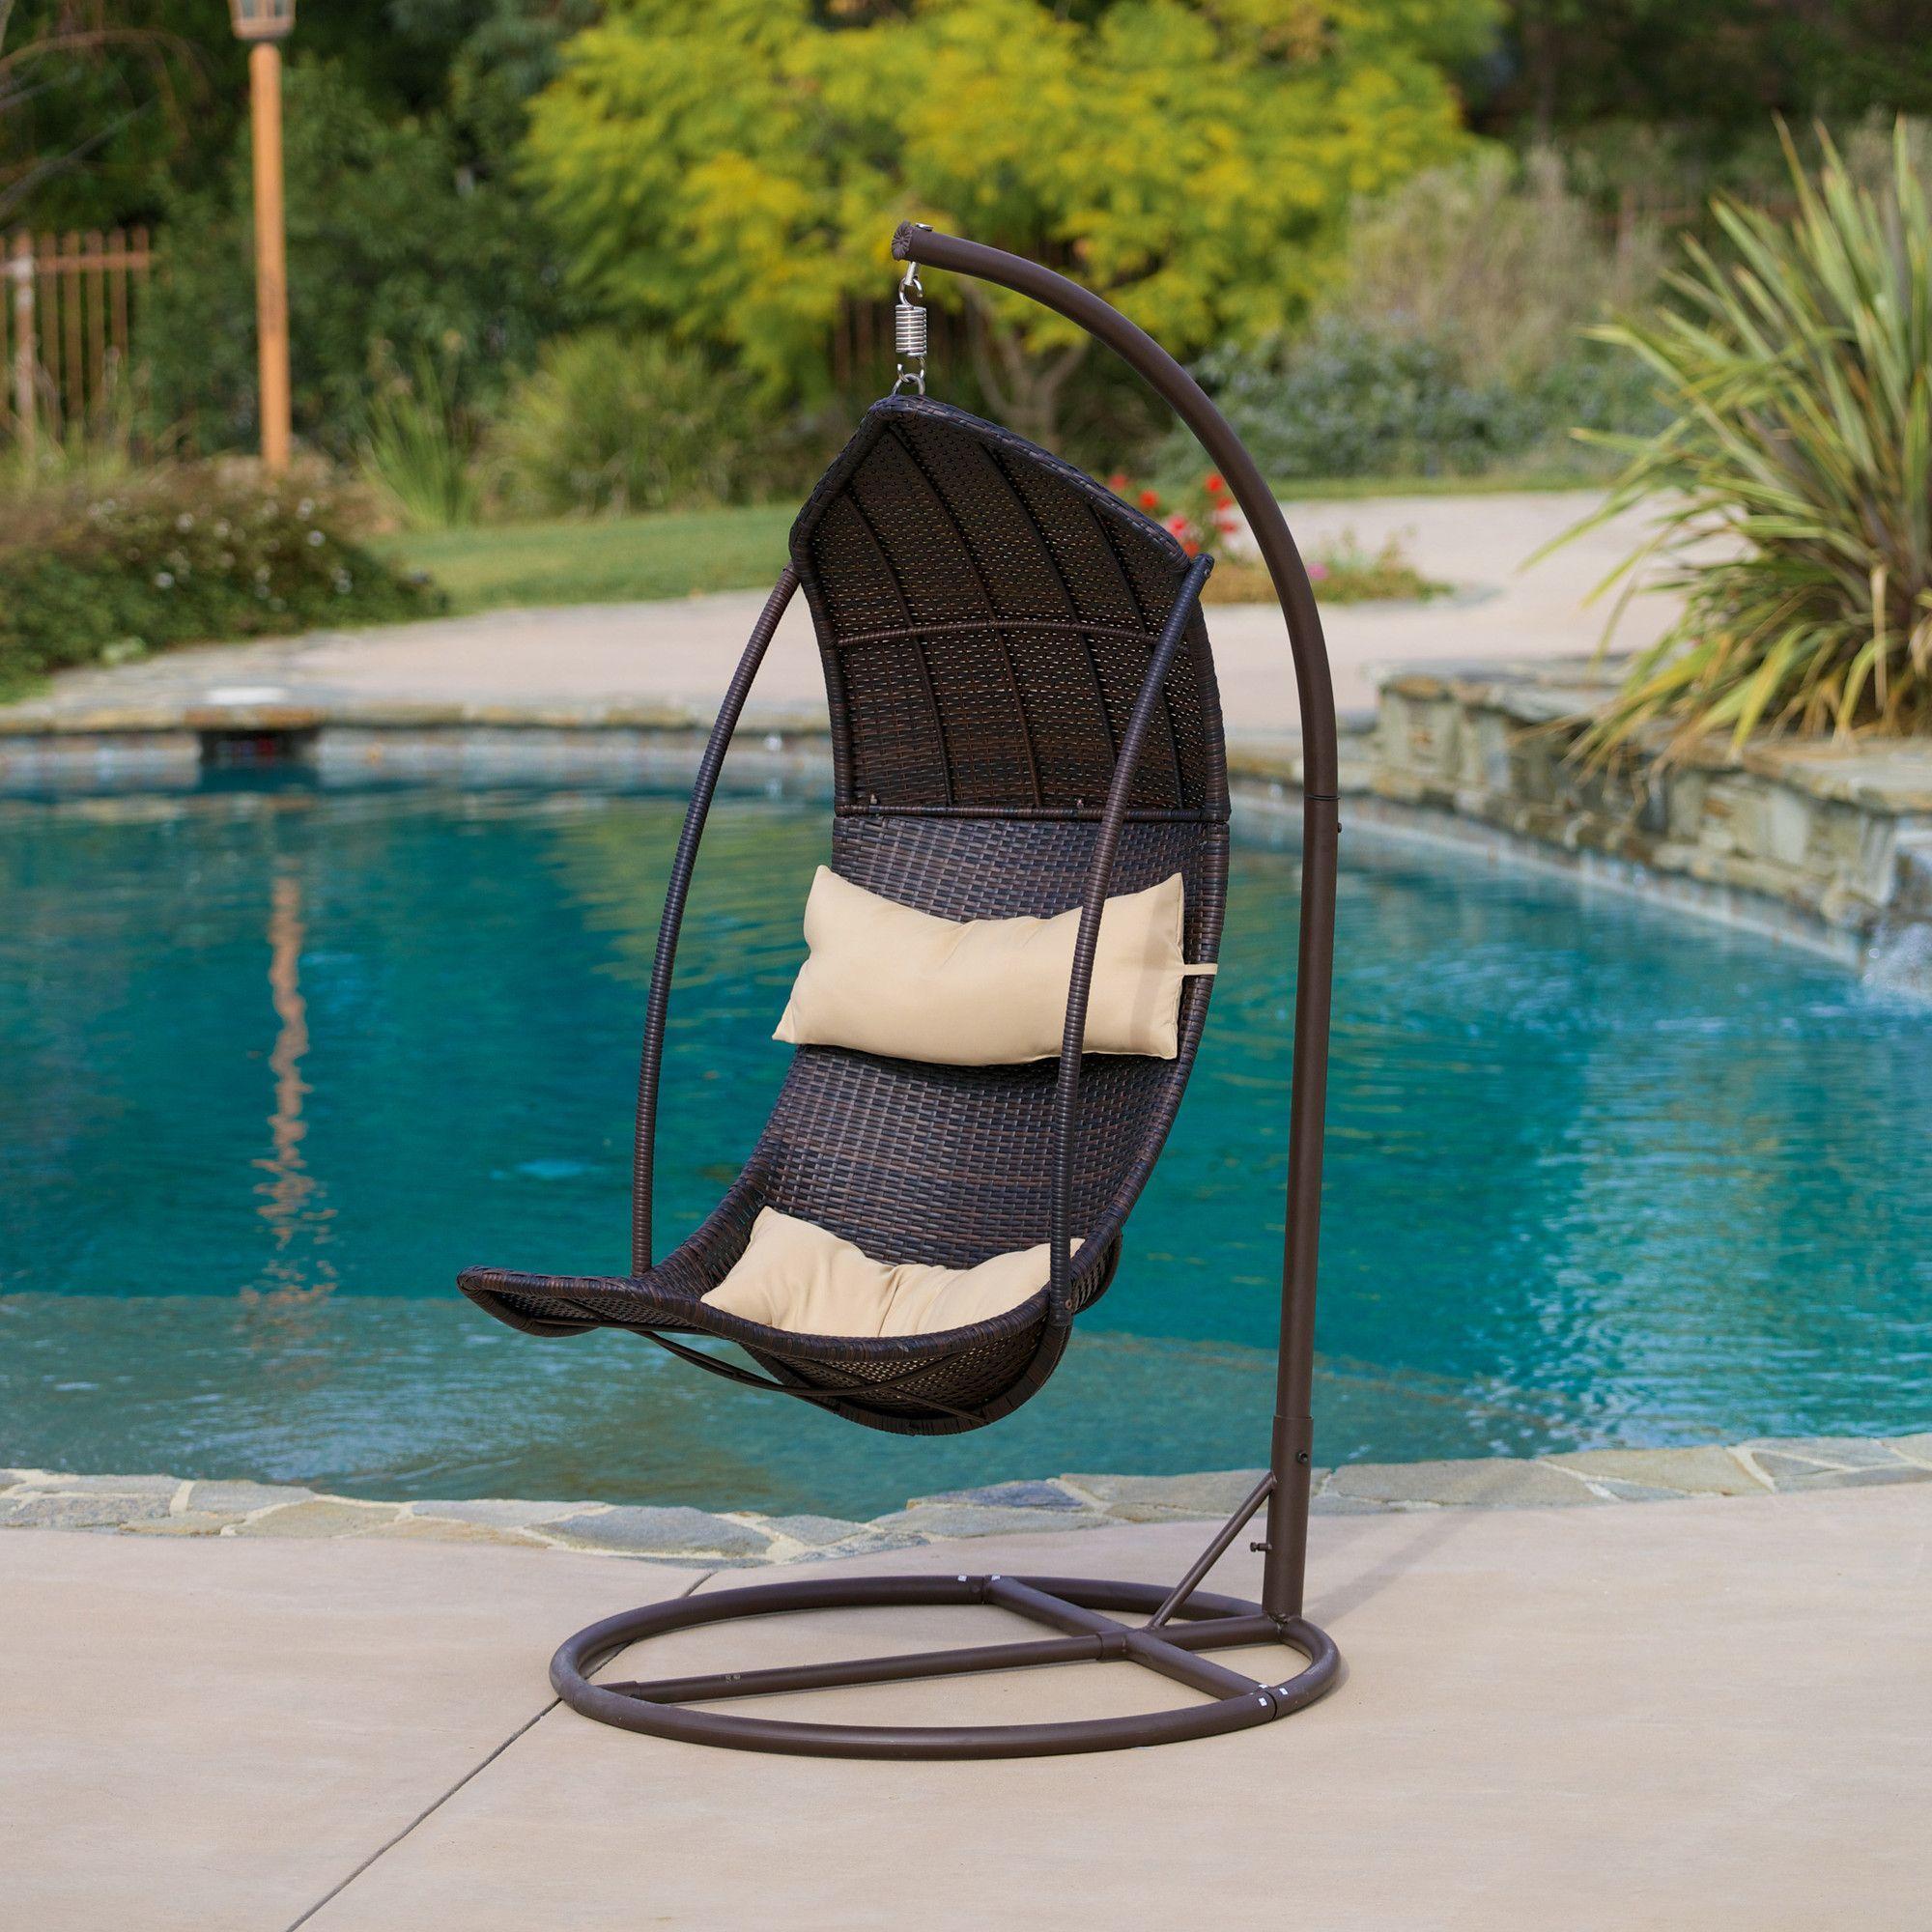 Park Art|My WordPress Blog_Woven Lounge Chair Earth Brown